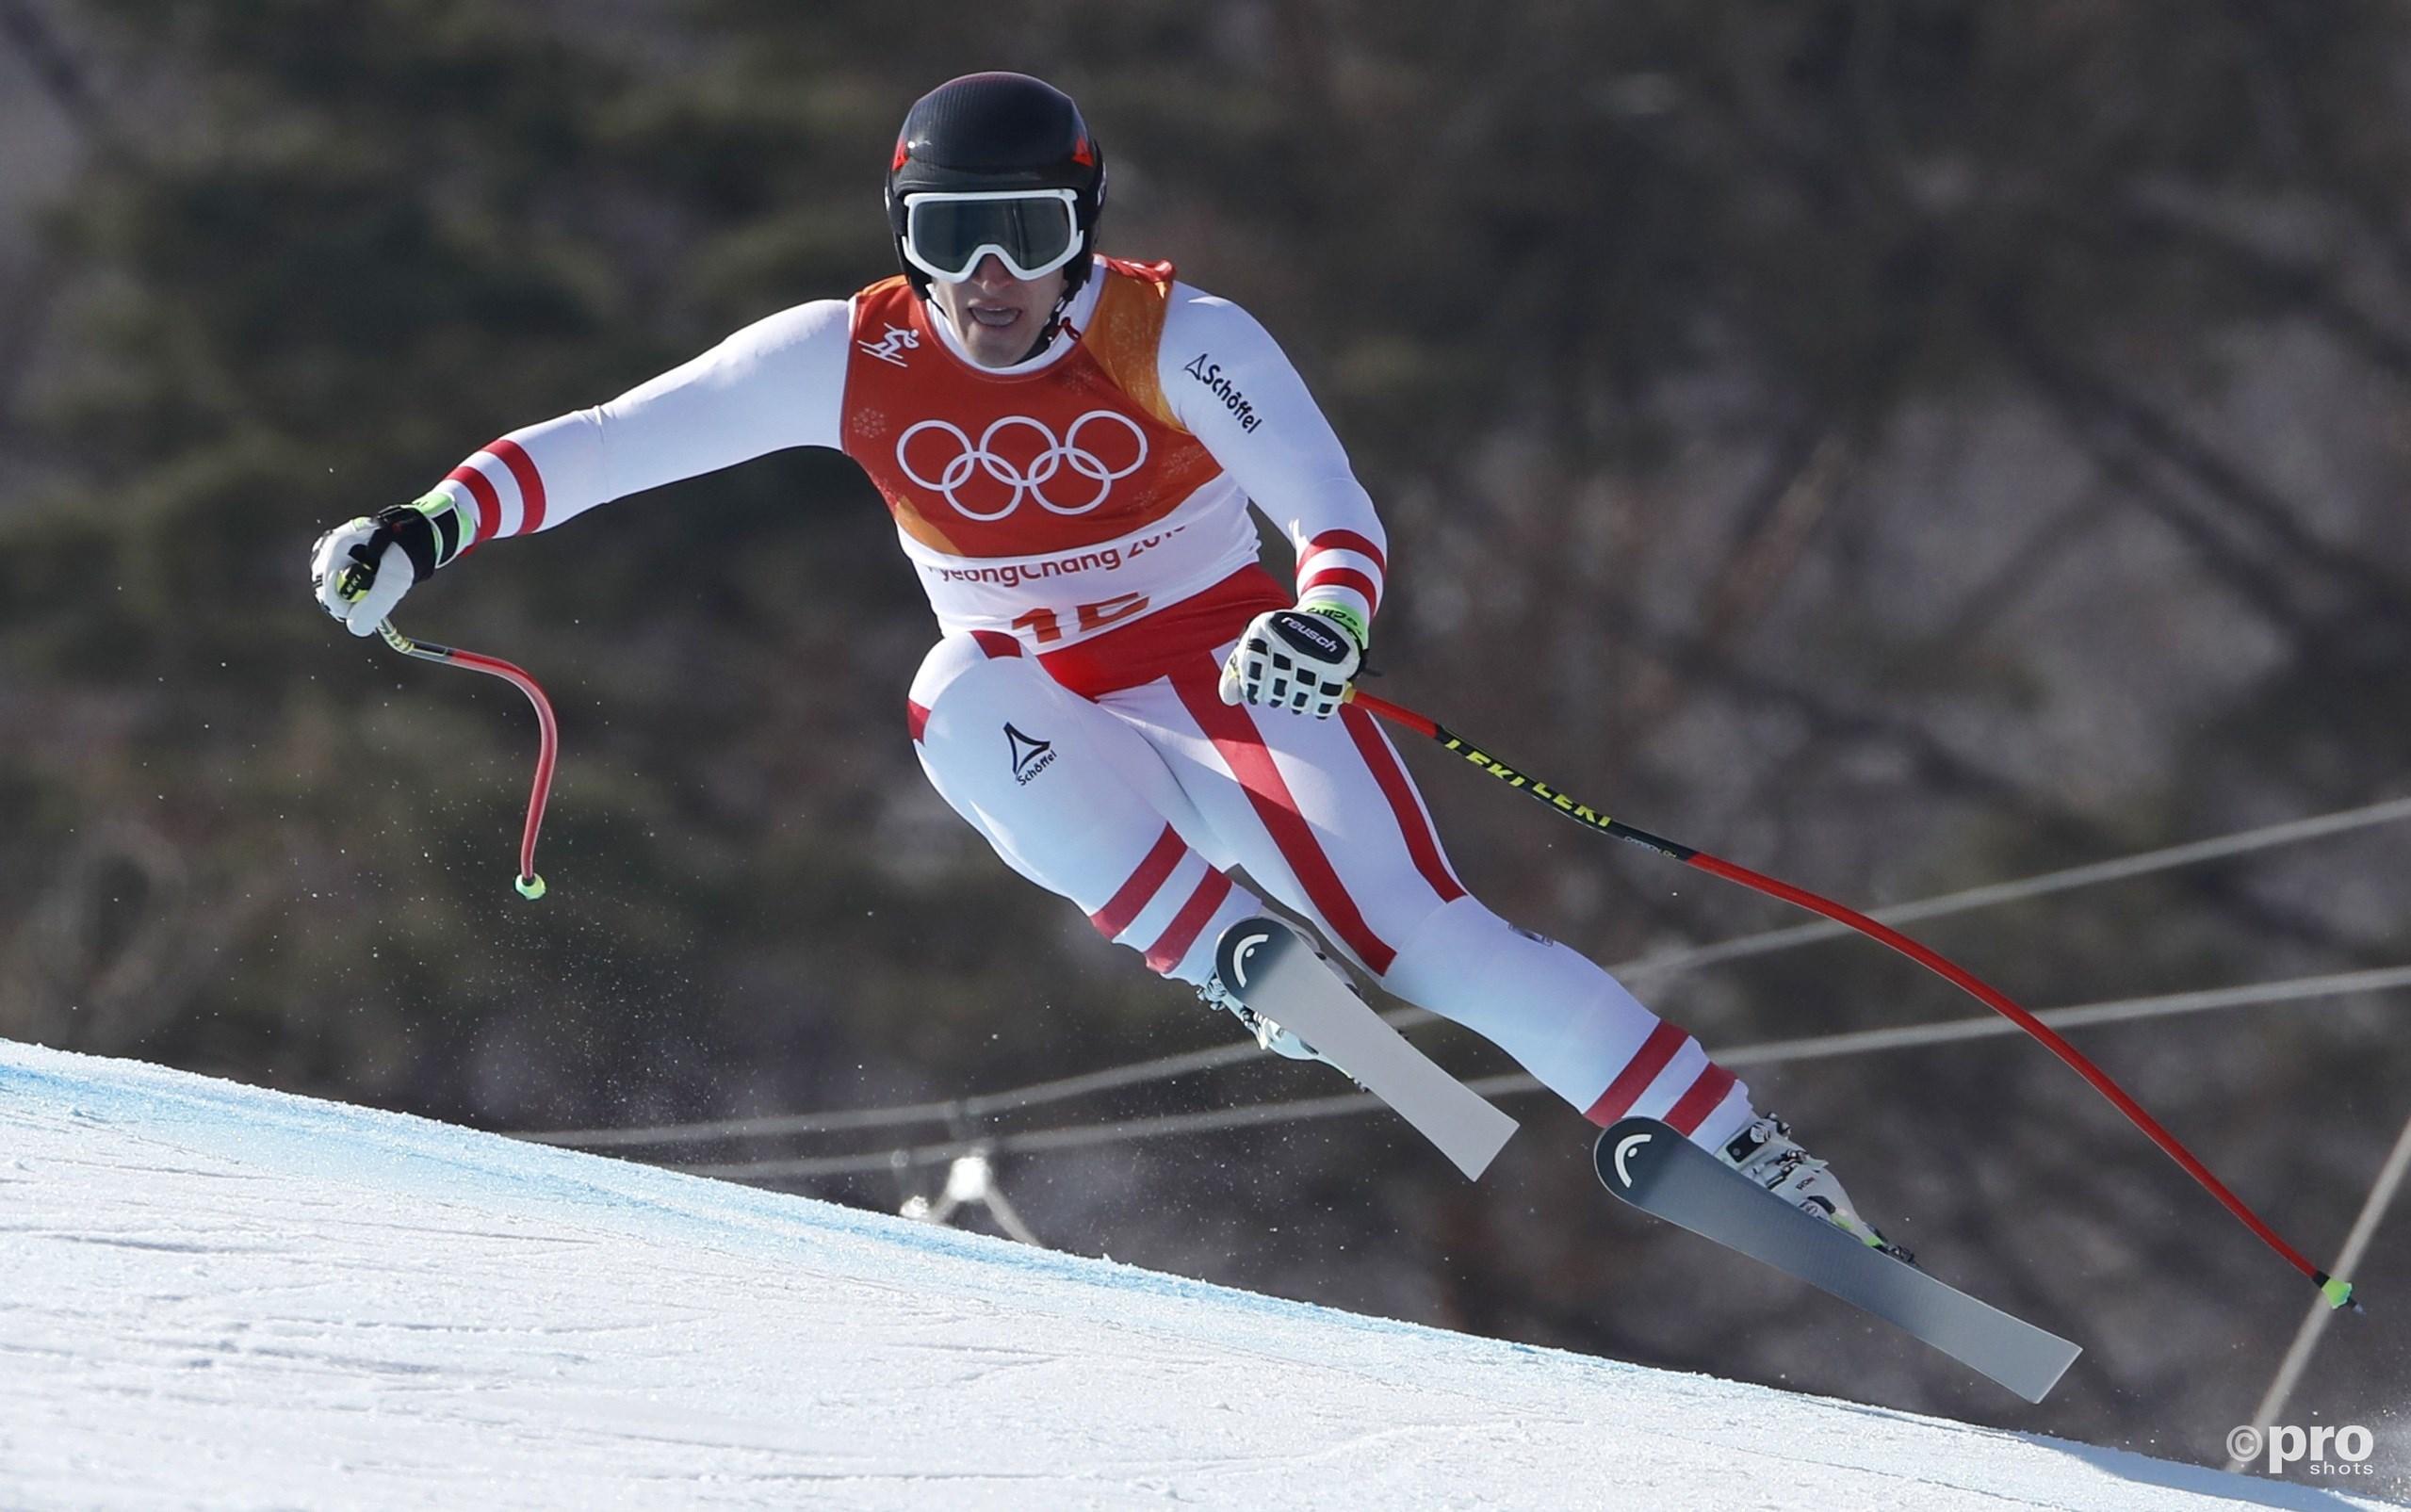 Mayer op weg naar toch wel ietwat verrassend olympisch goud (Pro Shots/Action Images)